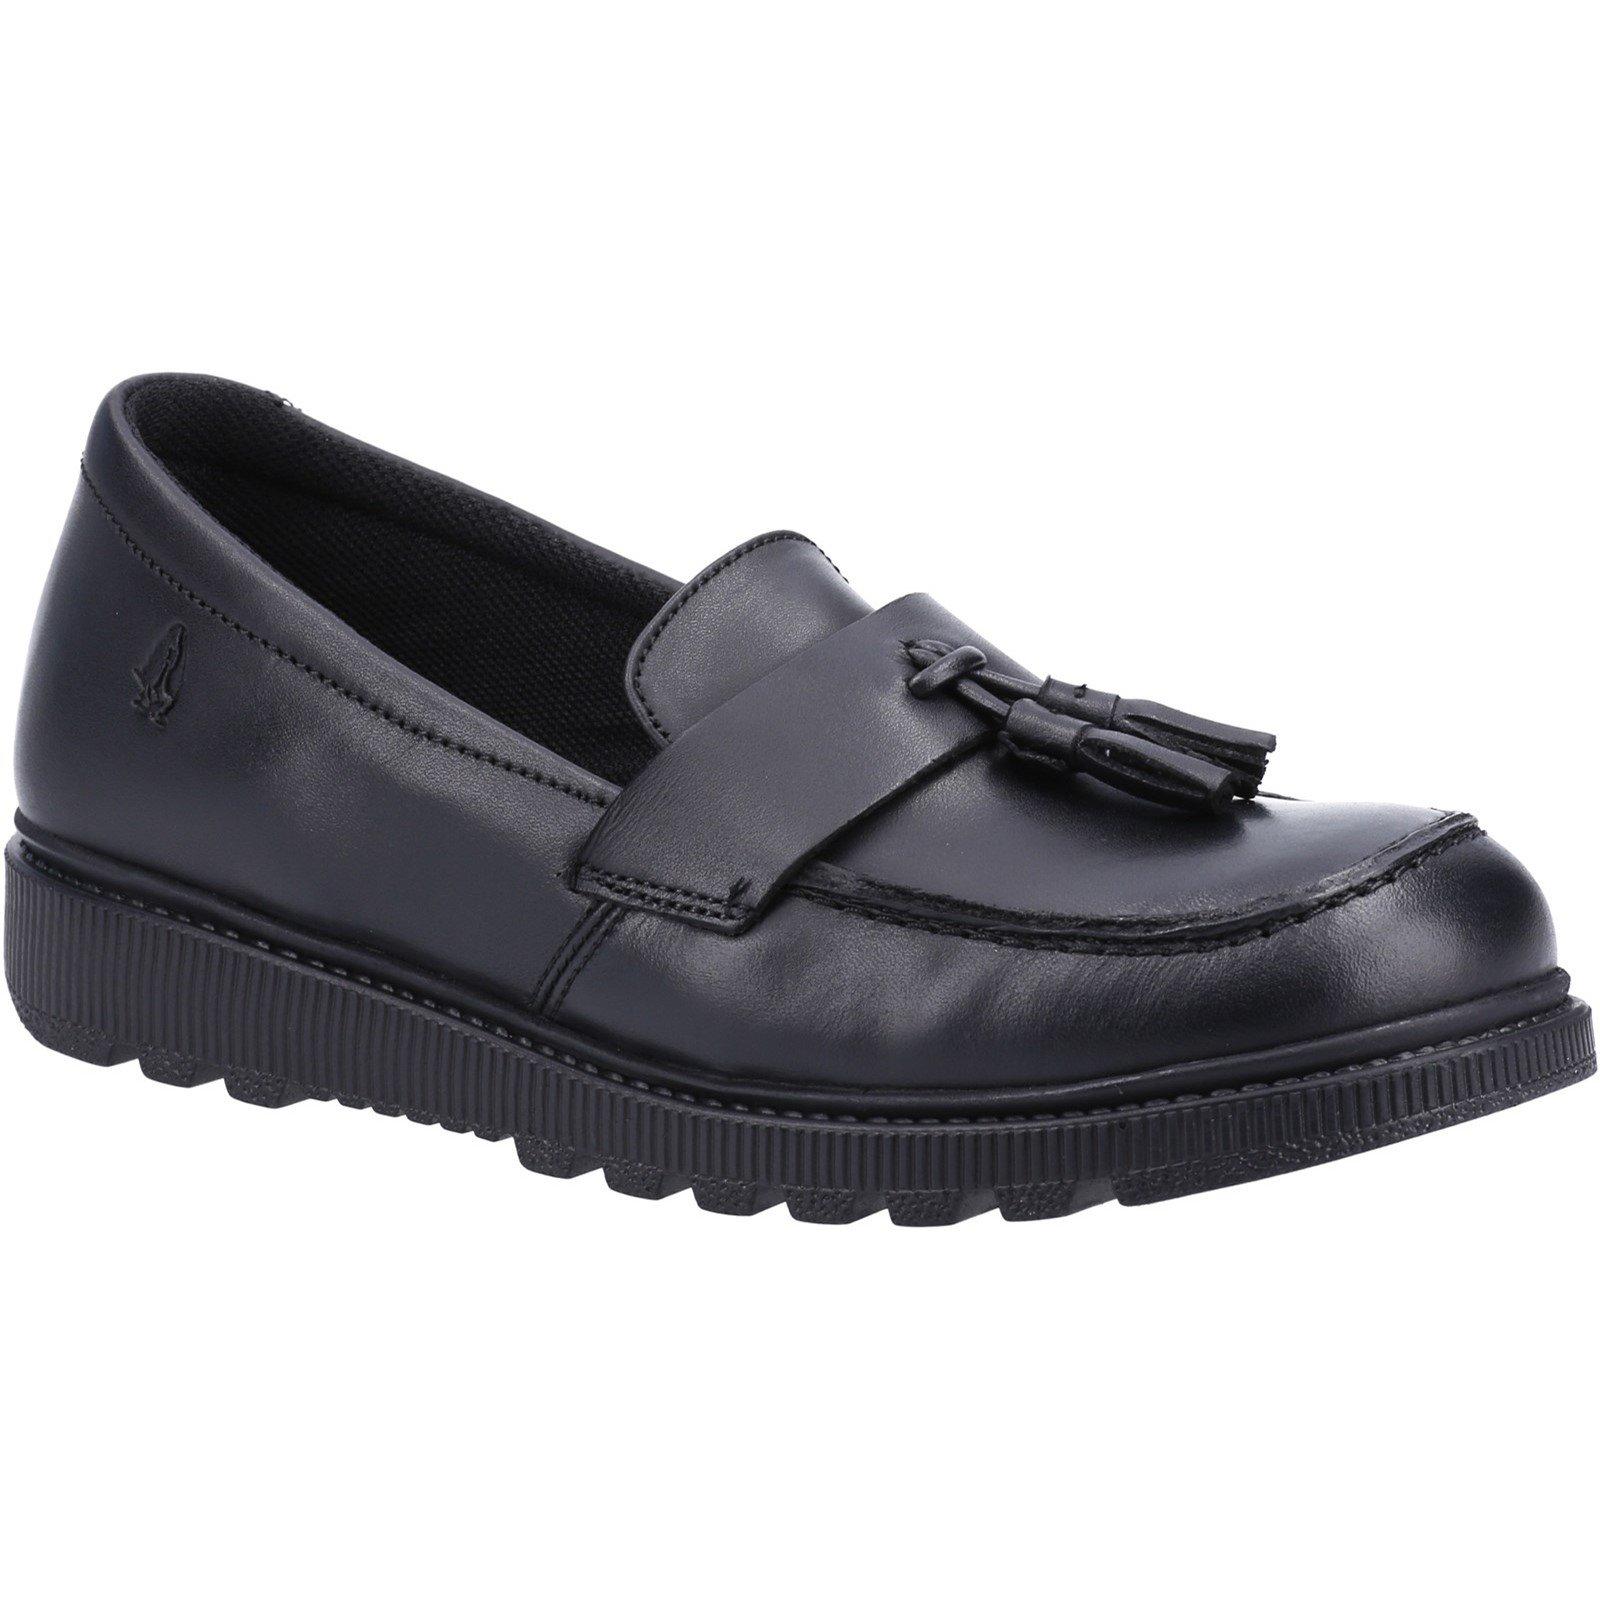 Hush Puppies Kid's Faye Senior School Shoe Patent Black 30844 - Patent Black 5